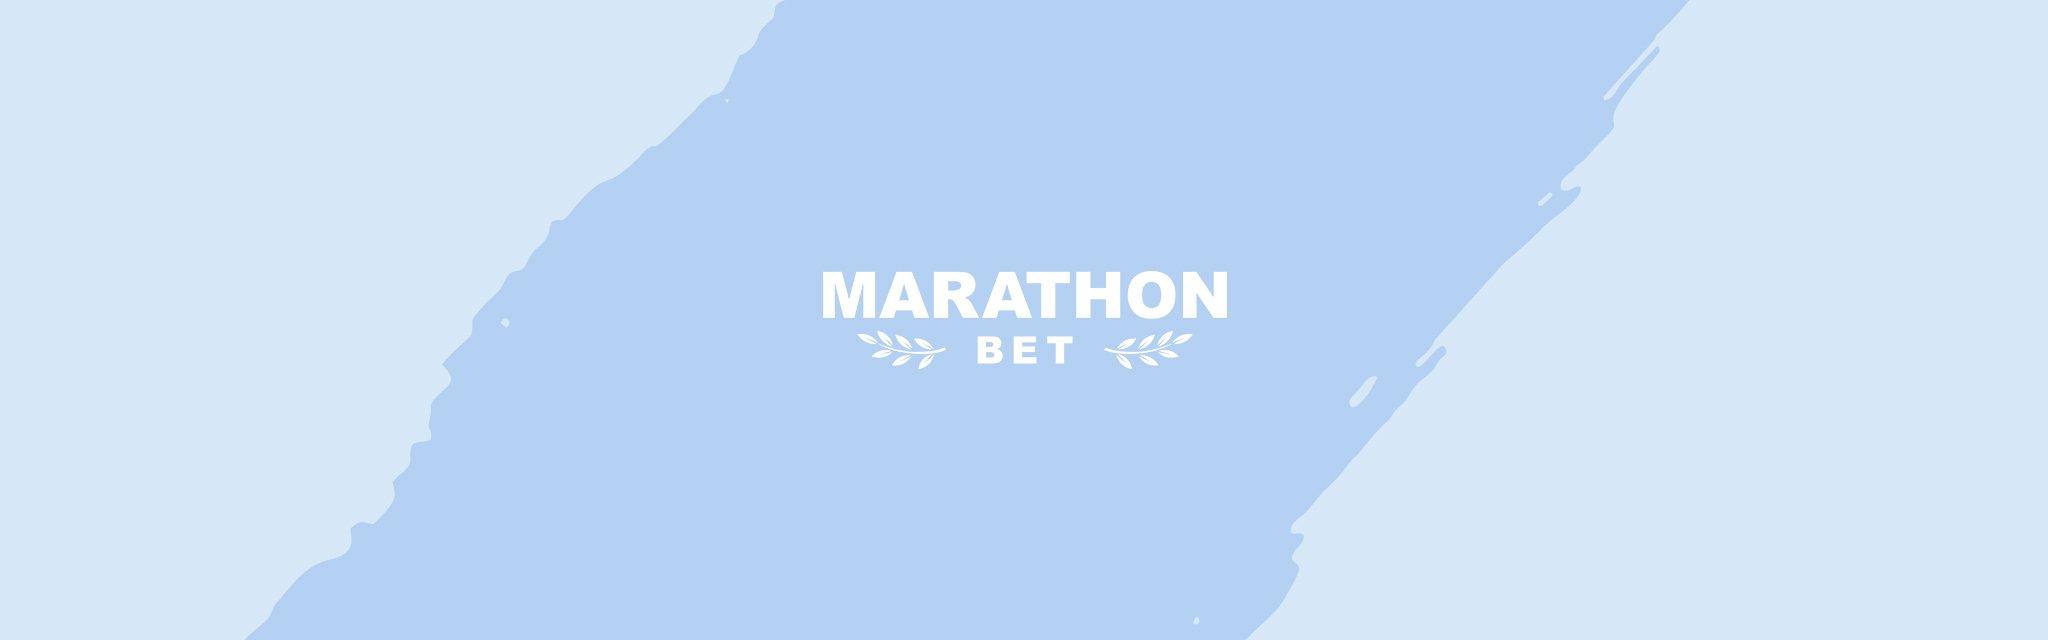 GiG MarathonBet